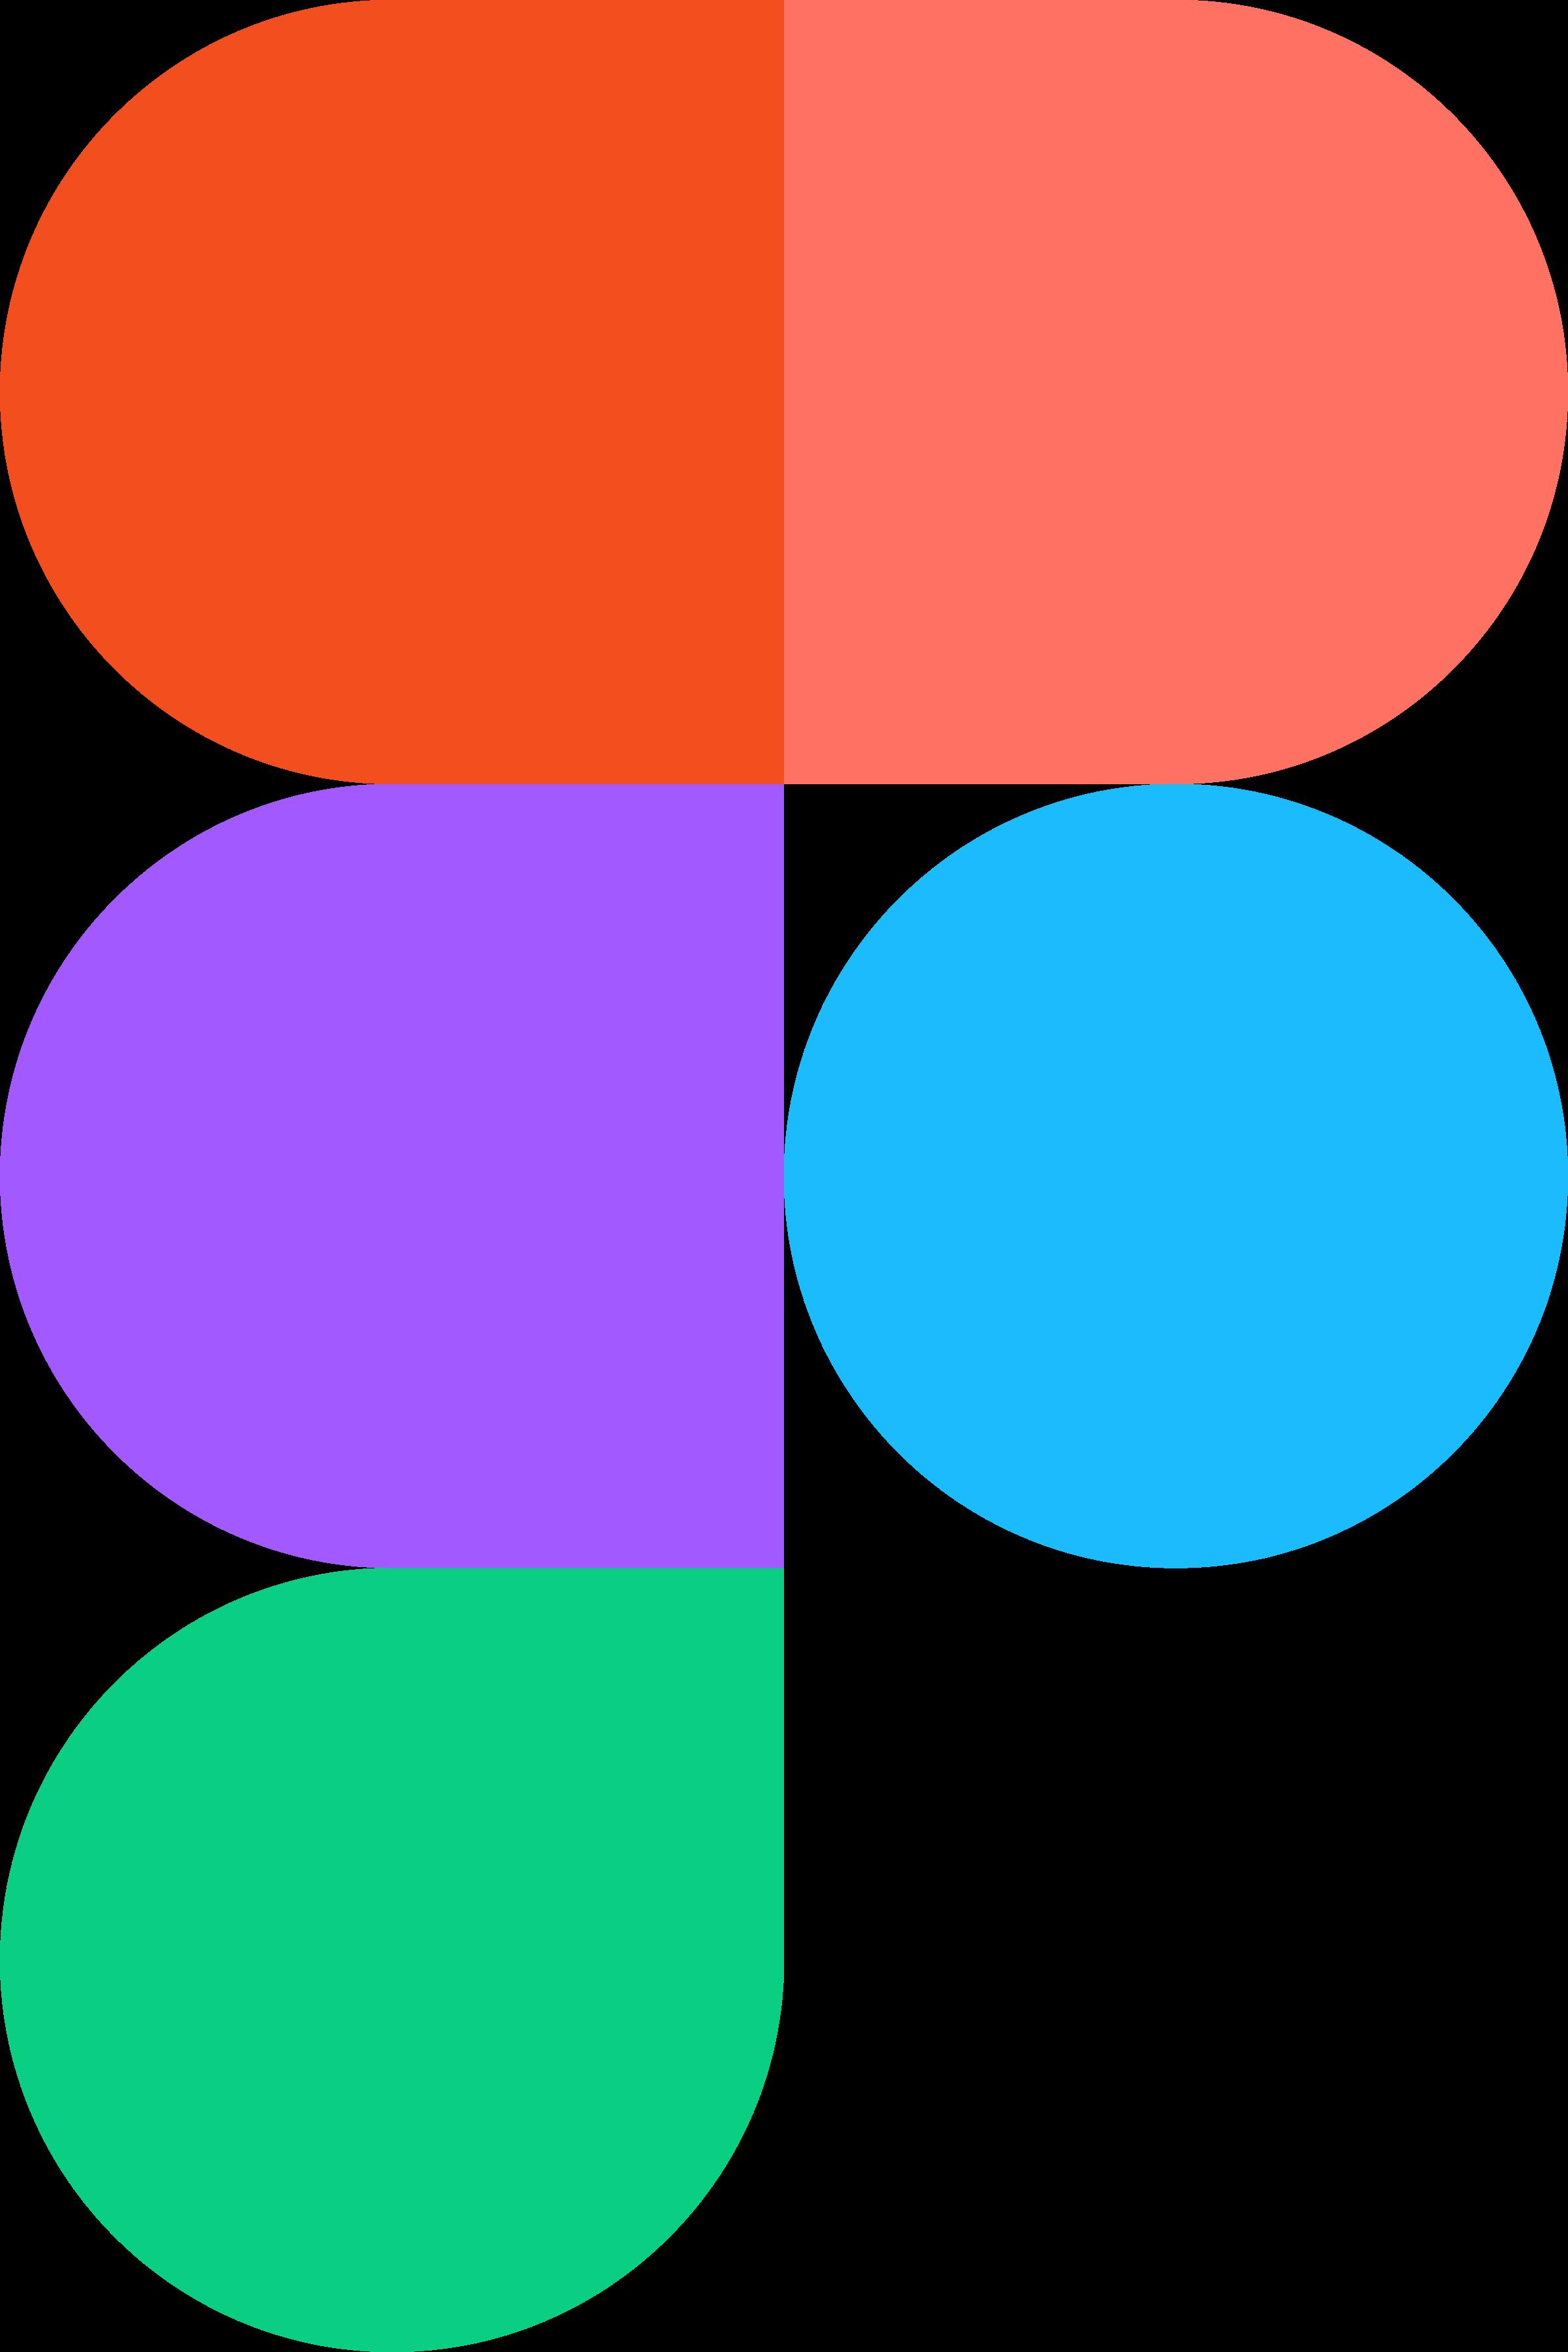 figma design development